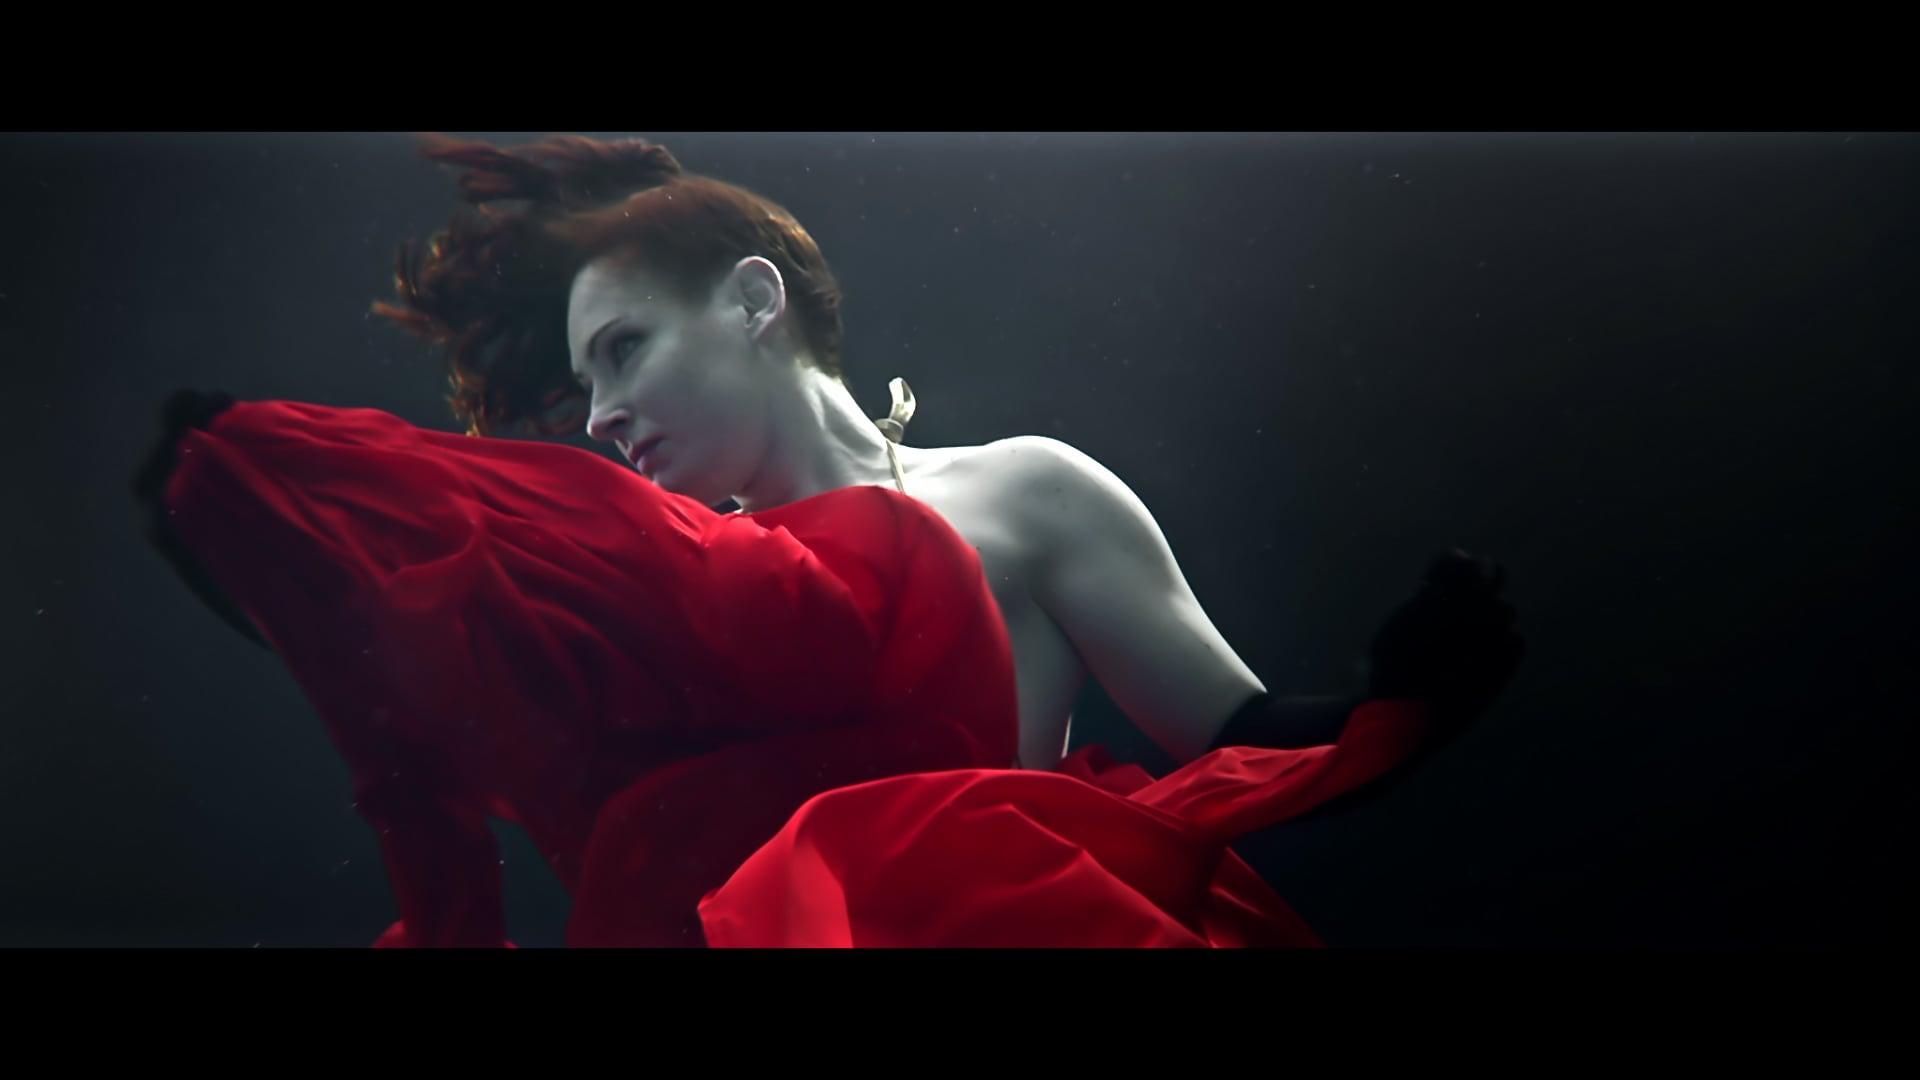 UNDERWATER IN RED - Promo